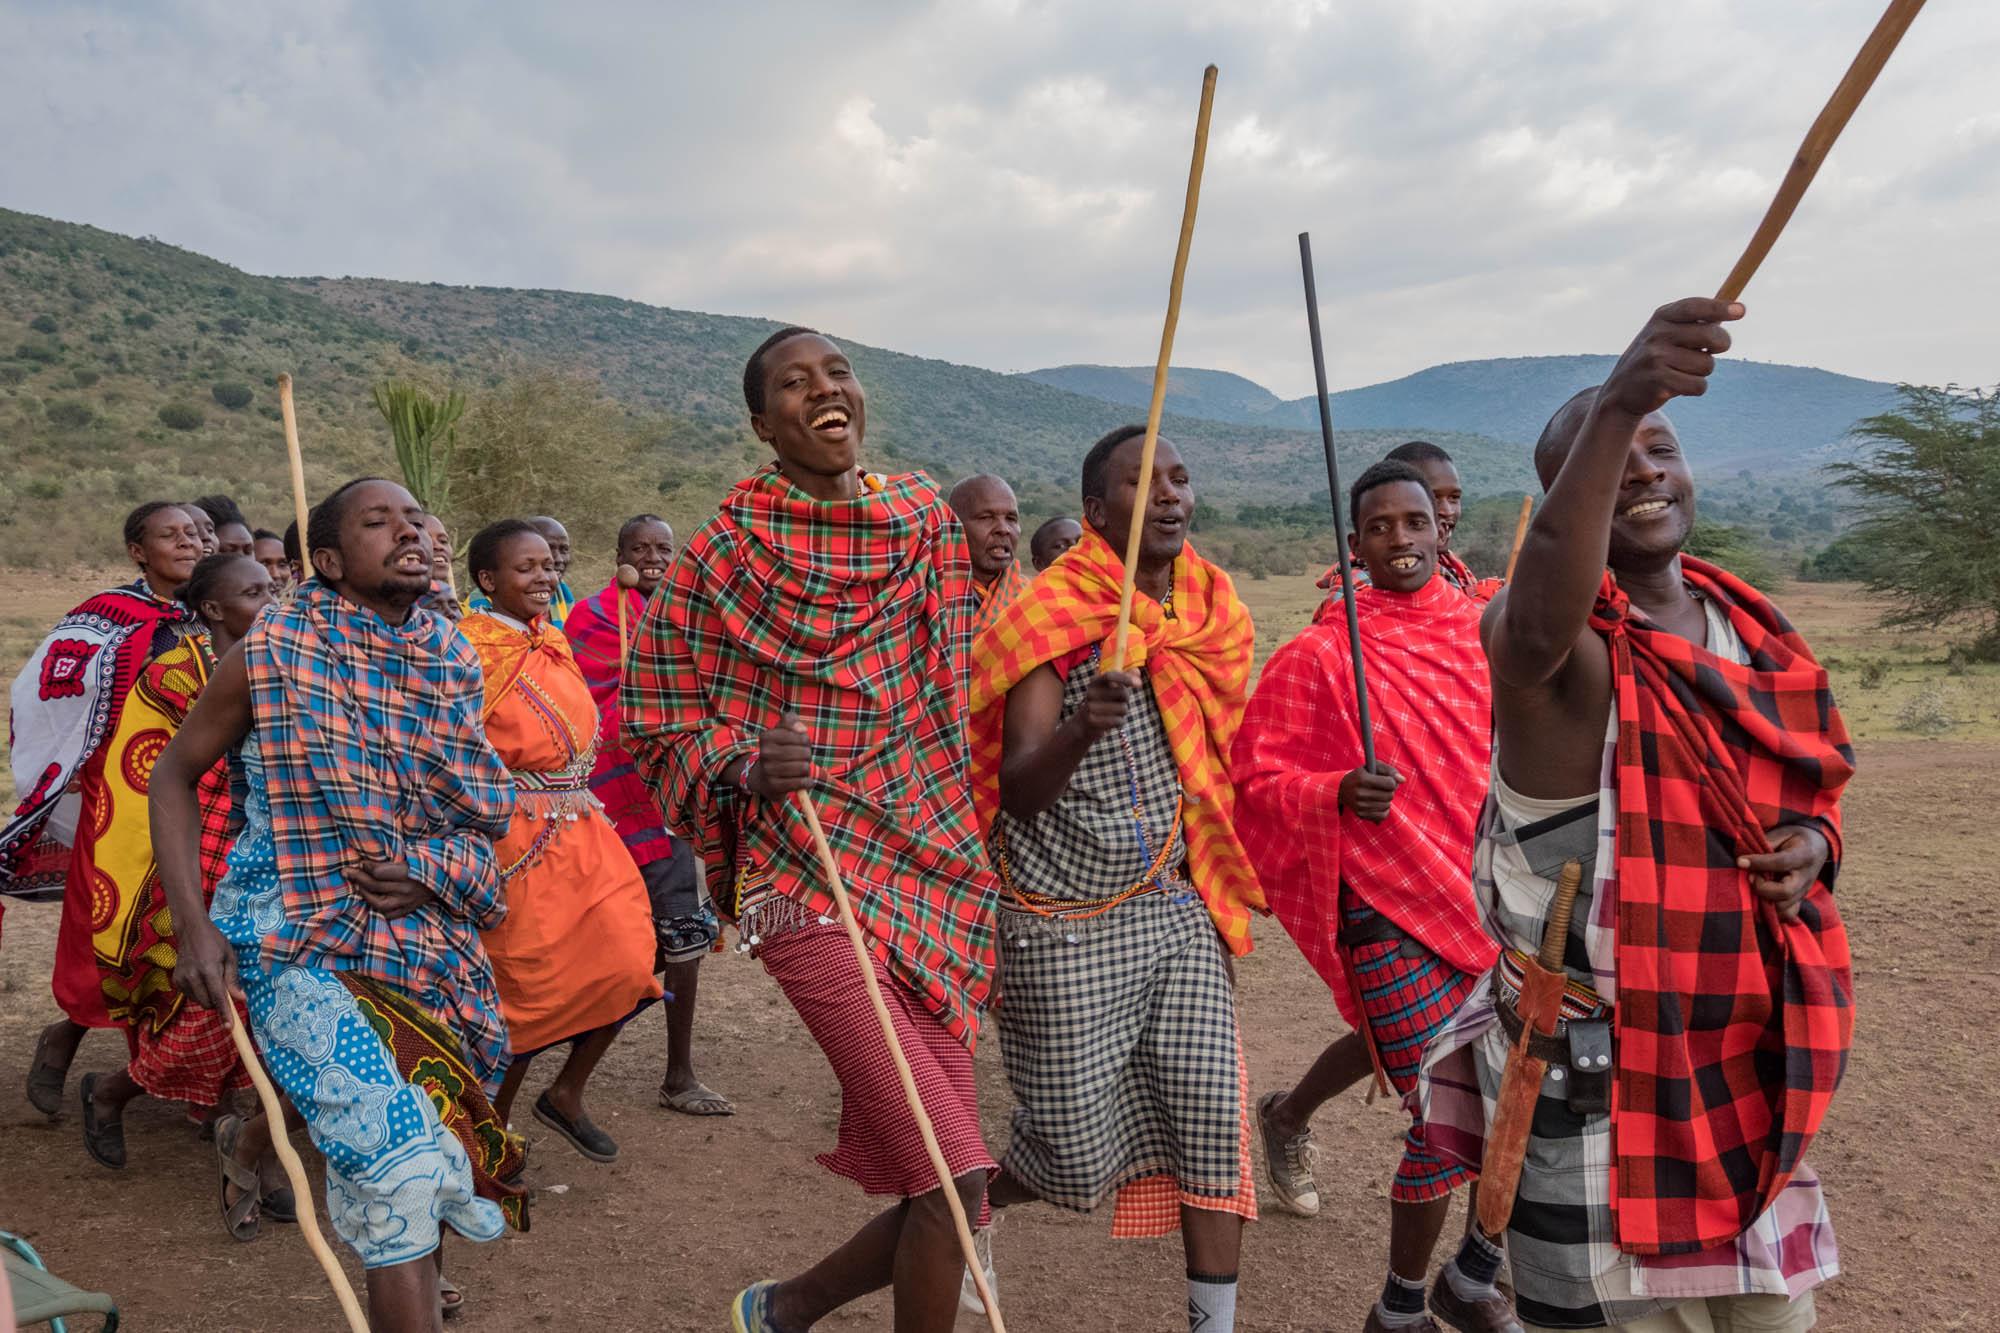 maasai-greeting-bogani-we-kenya-2018-01-01.jpg